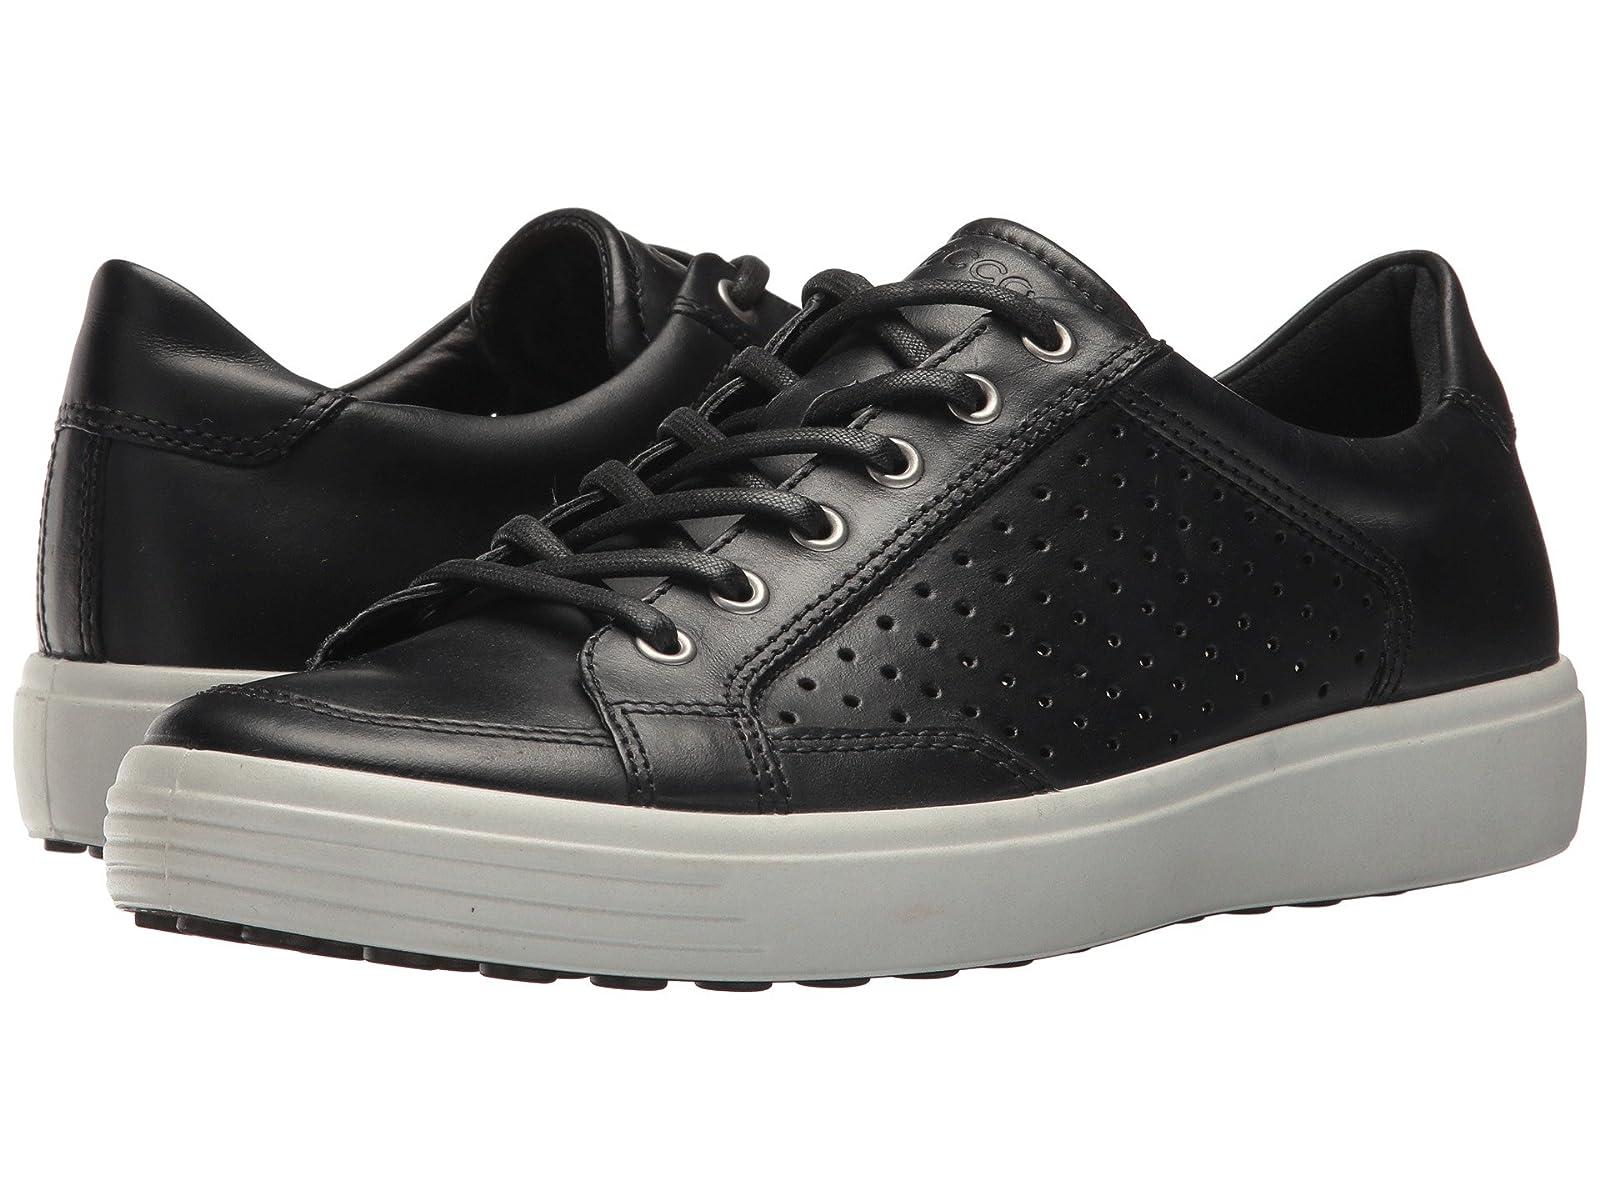 ECCO Soft 7 Retro TieAtmospheric grades have affordable shoes